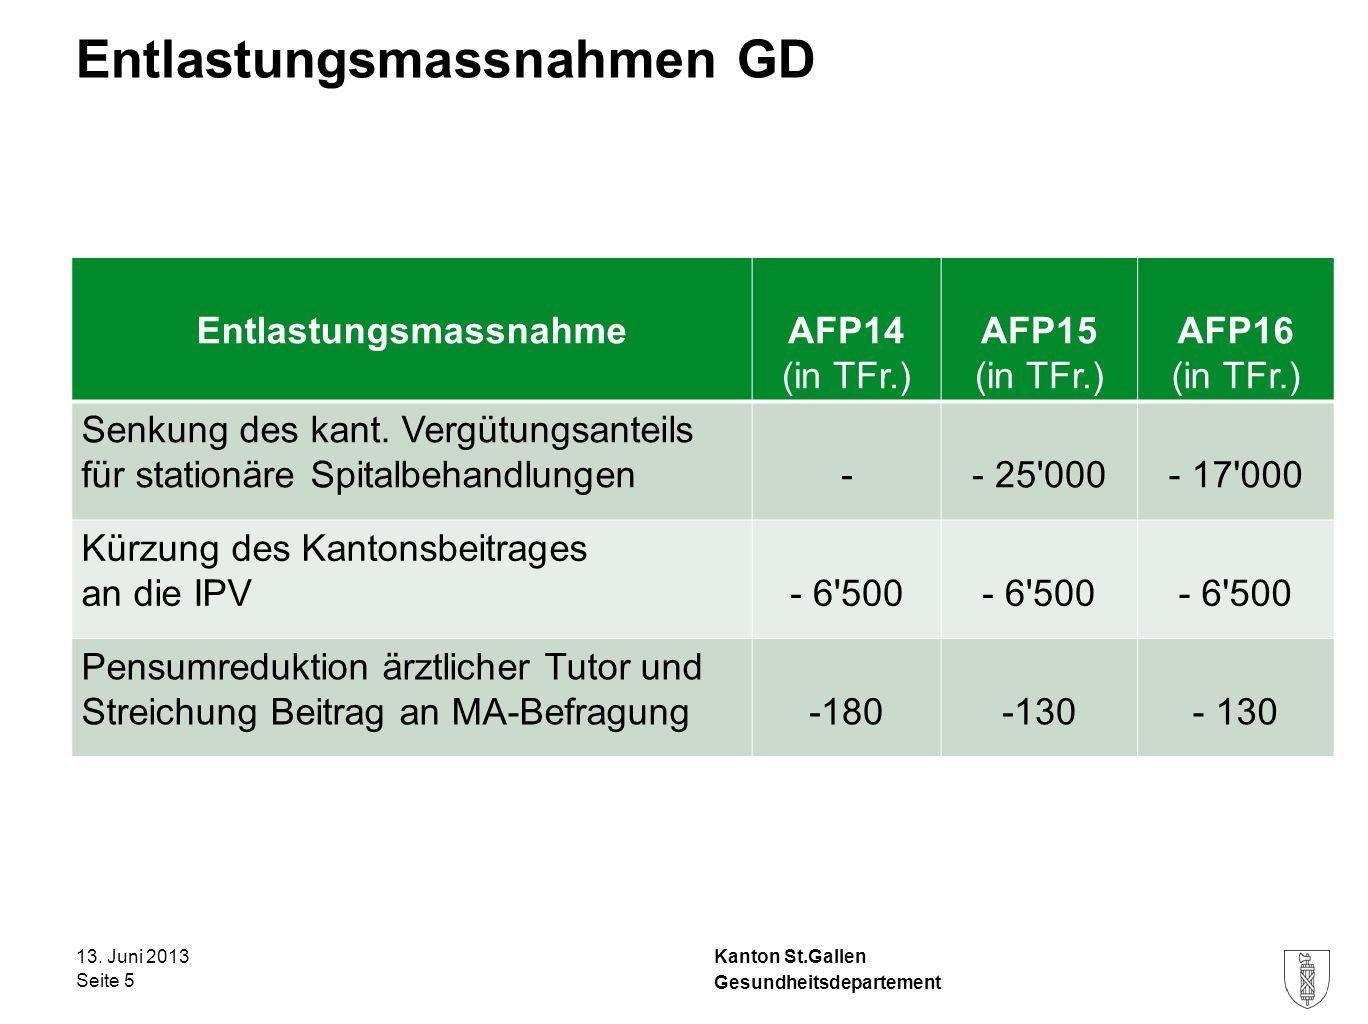 Kanton St.Gallen Entlastungsmassnahmen GD 13. Juni 2013 Seite 5 Gesundheitsdepartement EntlastungsmassnahmeAFP14 (in TFr.) AFP15 (in TFr.) AFP16 (in T